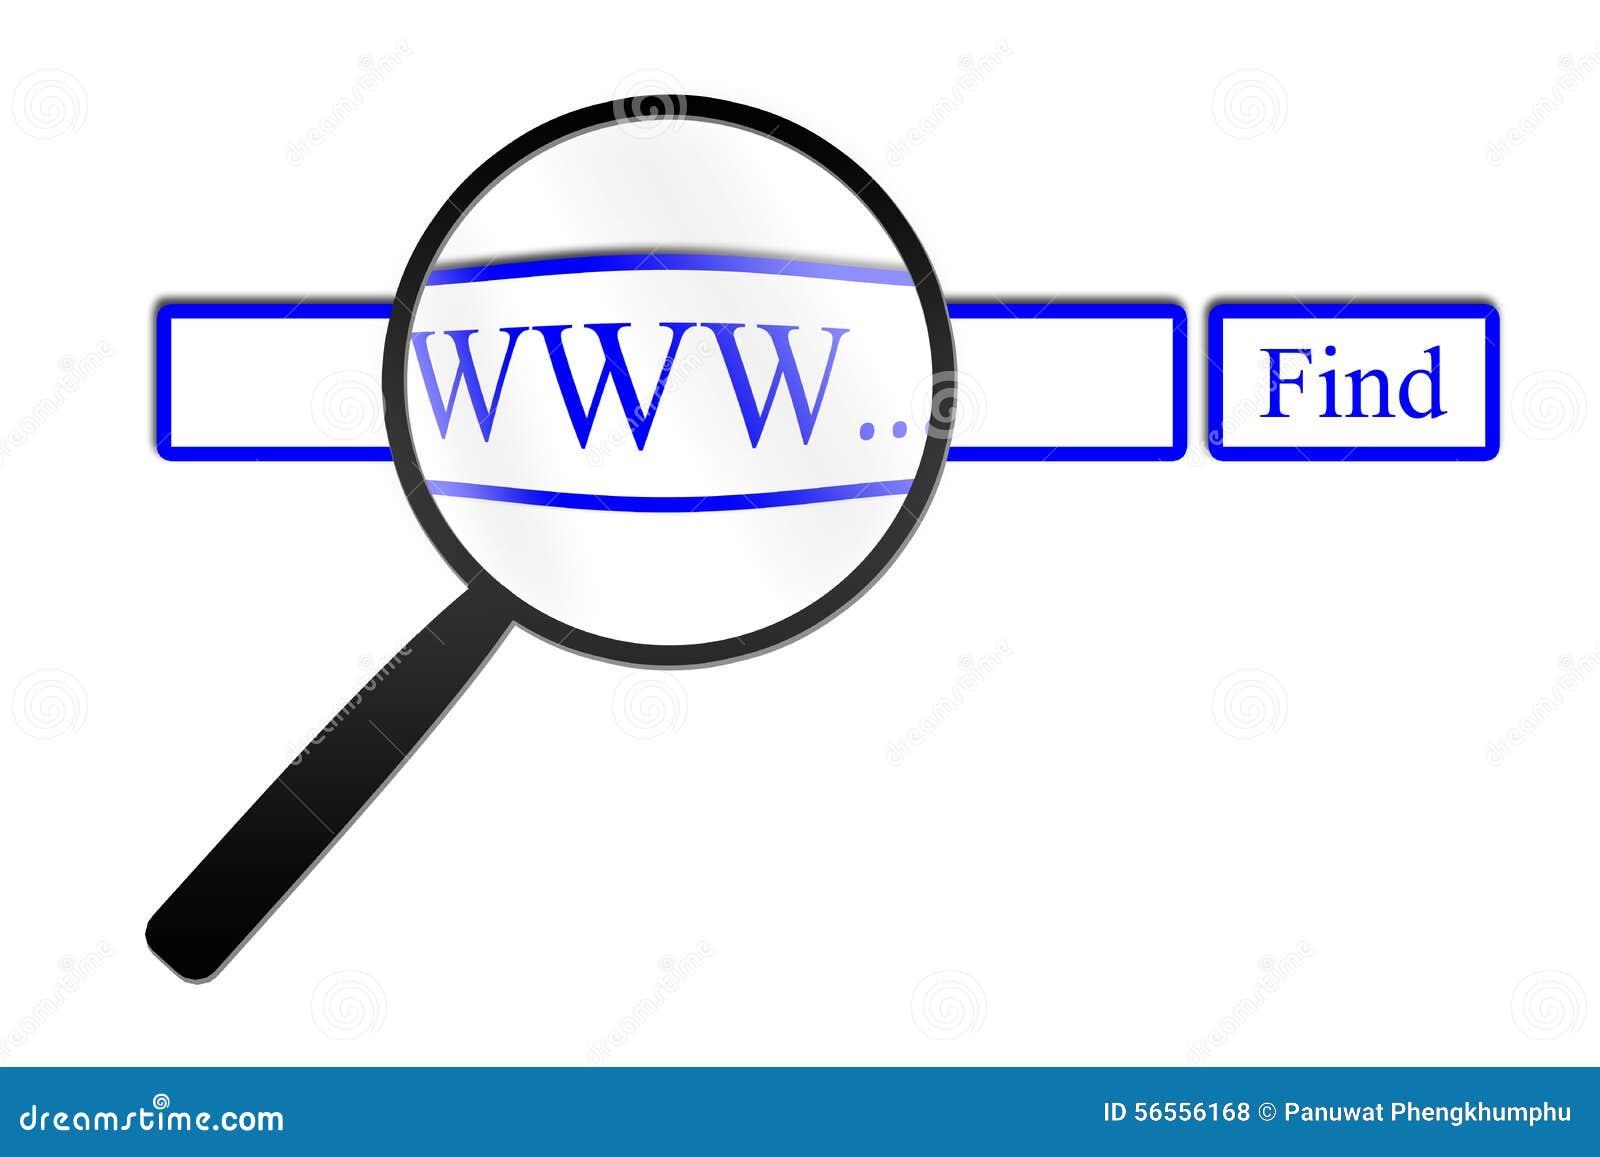 Download Ενίσχυση - γυαλί που βρίσκει τον Ιστό Στοκ Εικόνες - εικόνα από βρείτε, ενισχύστε: 56556168